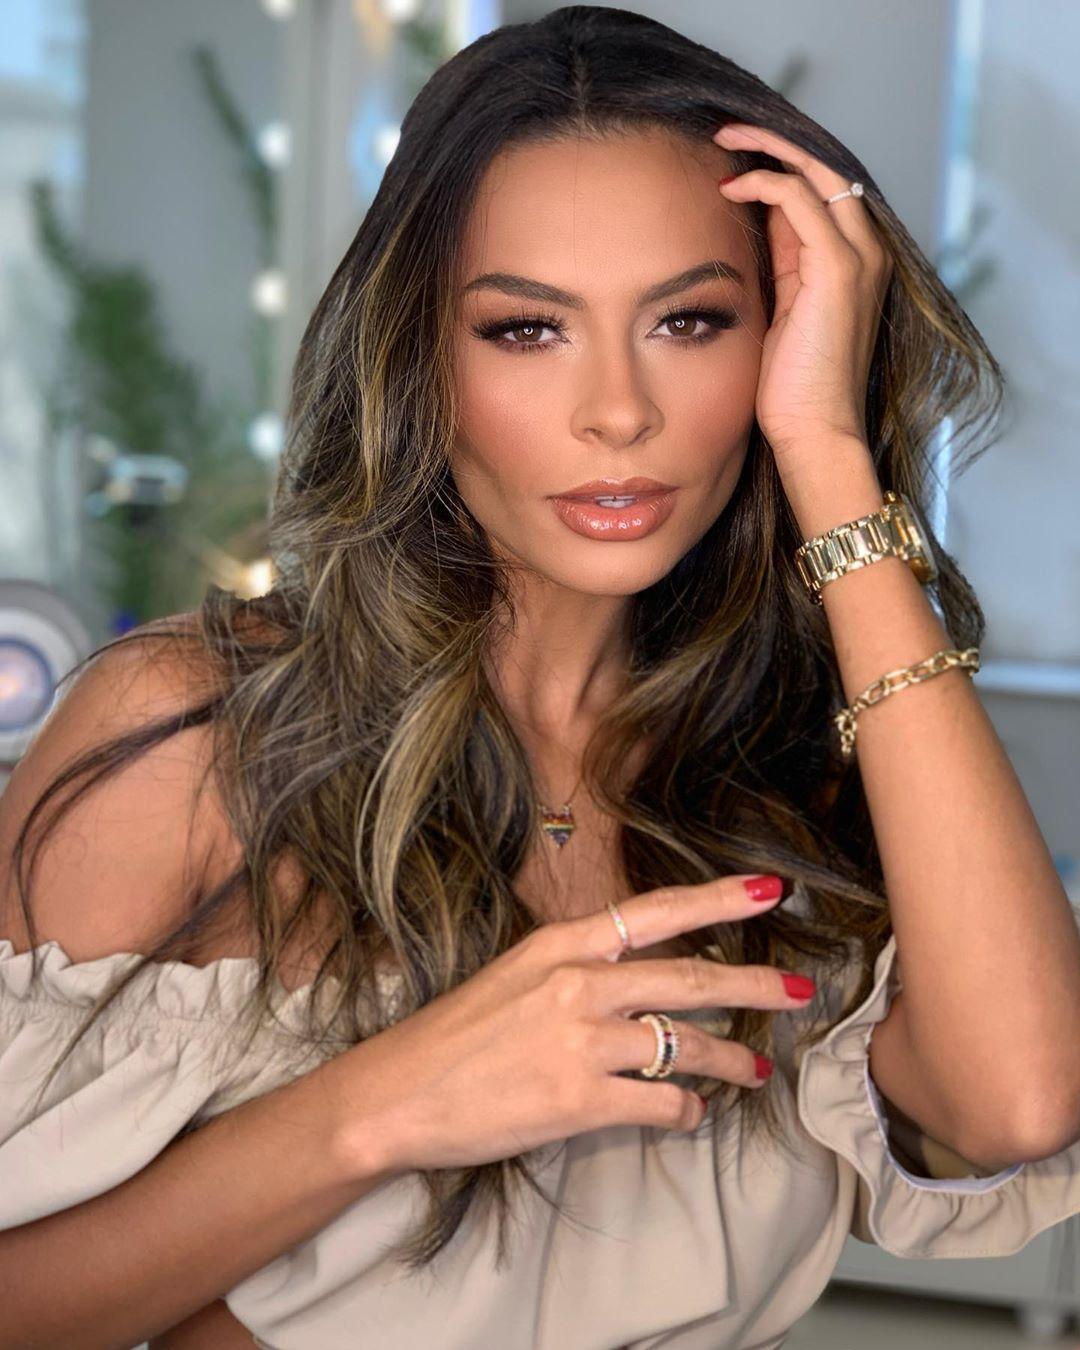 stephany pim, miss eco brasil 2017/top 3 de miss brasil universo 2017. - Página 10 10117710